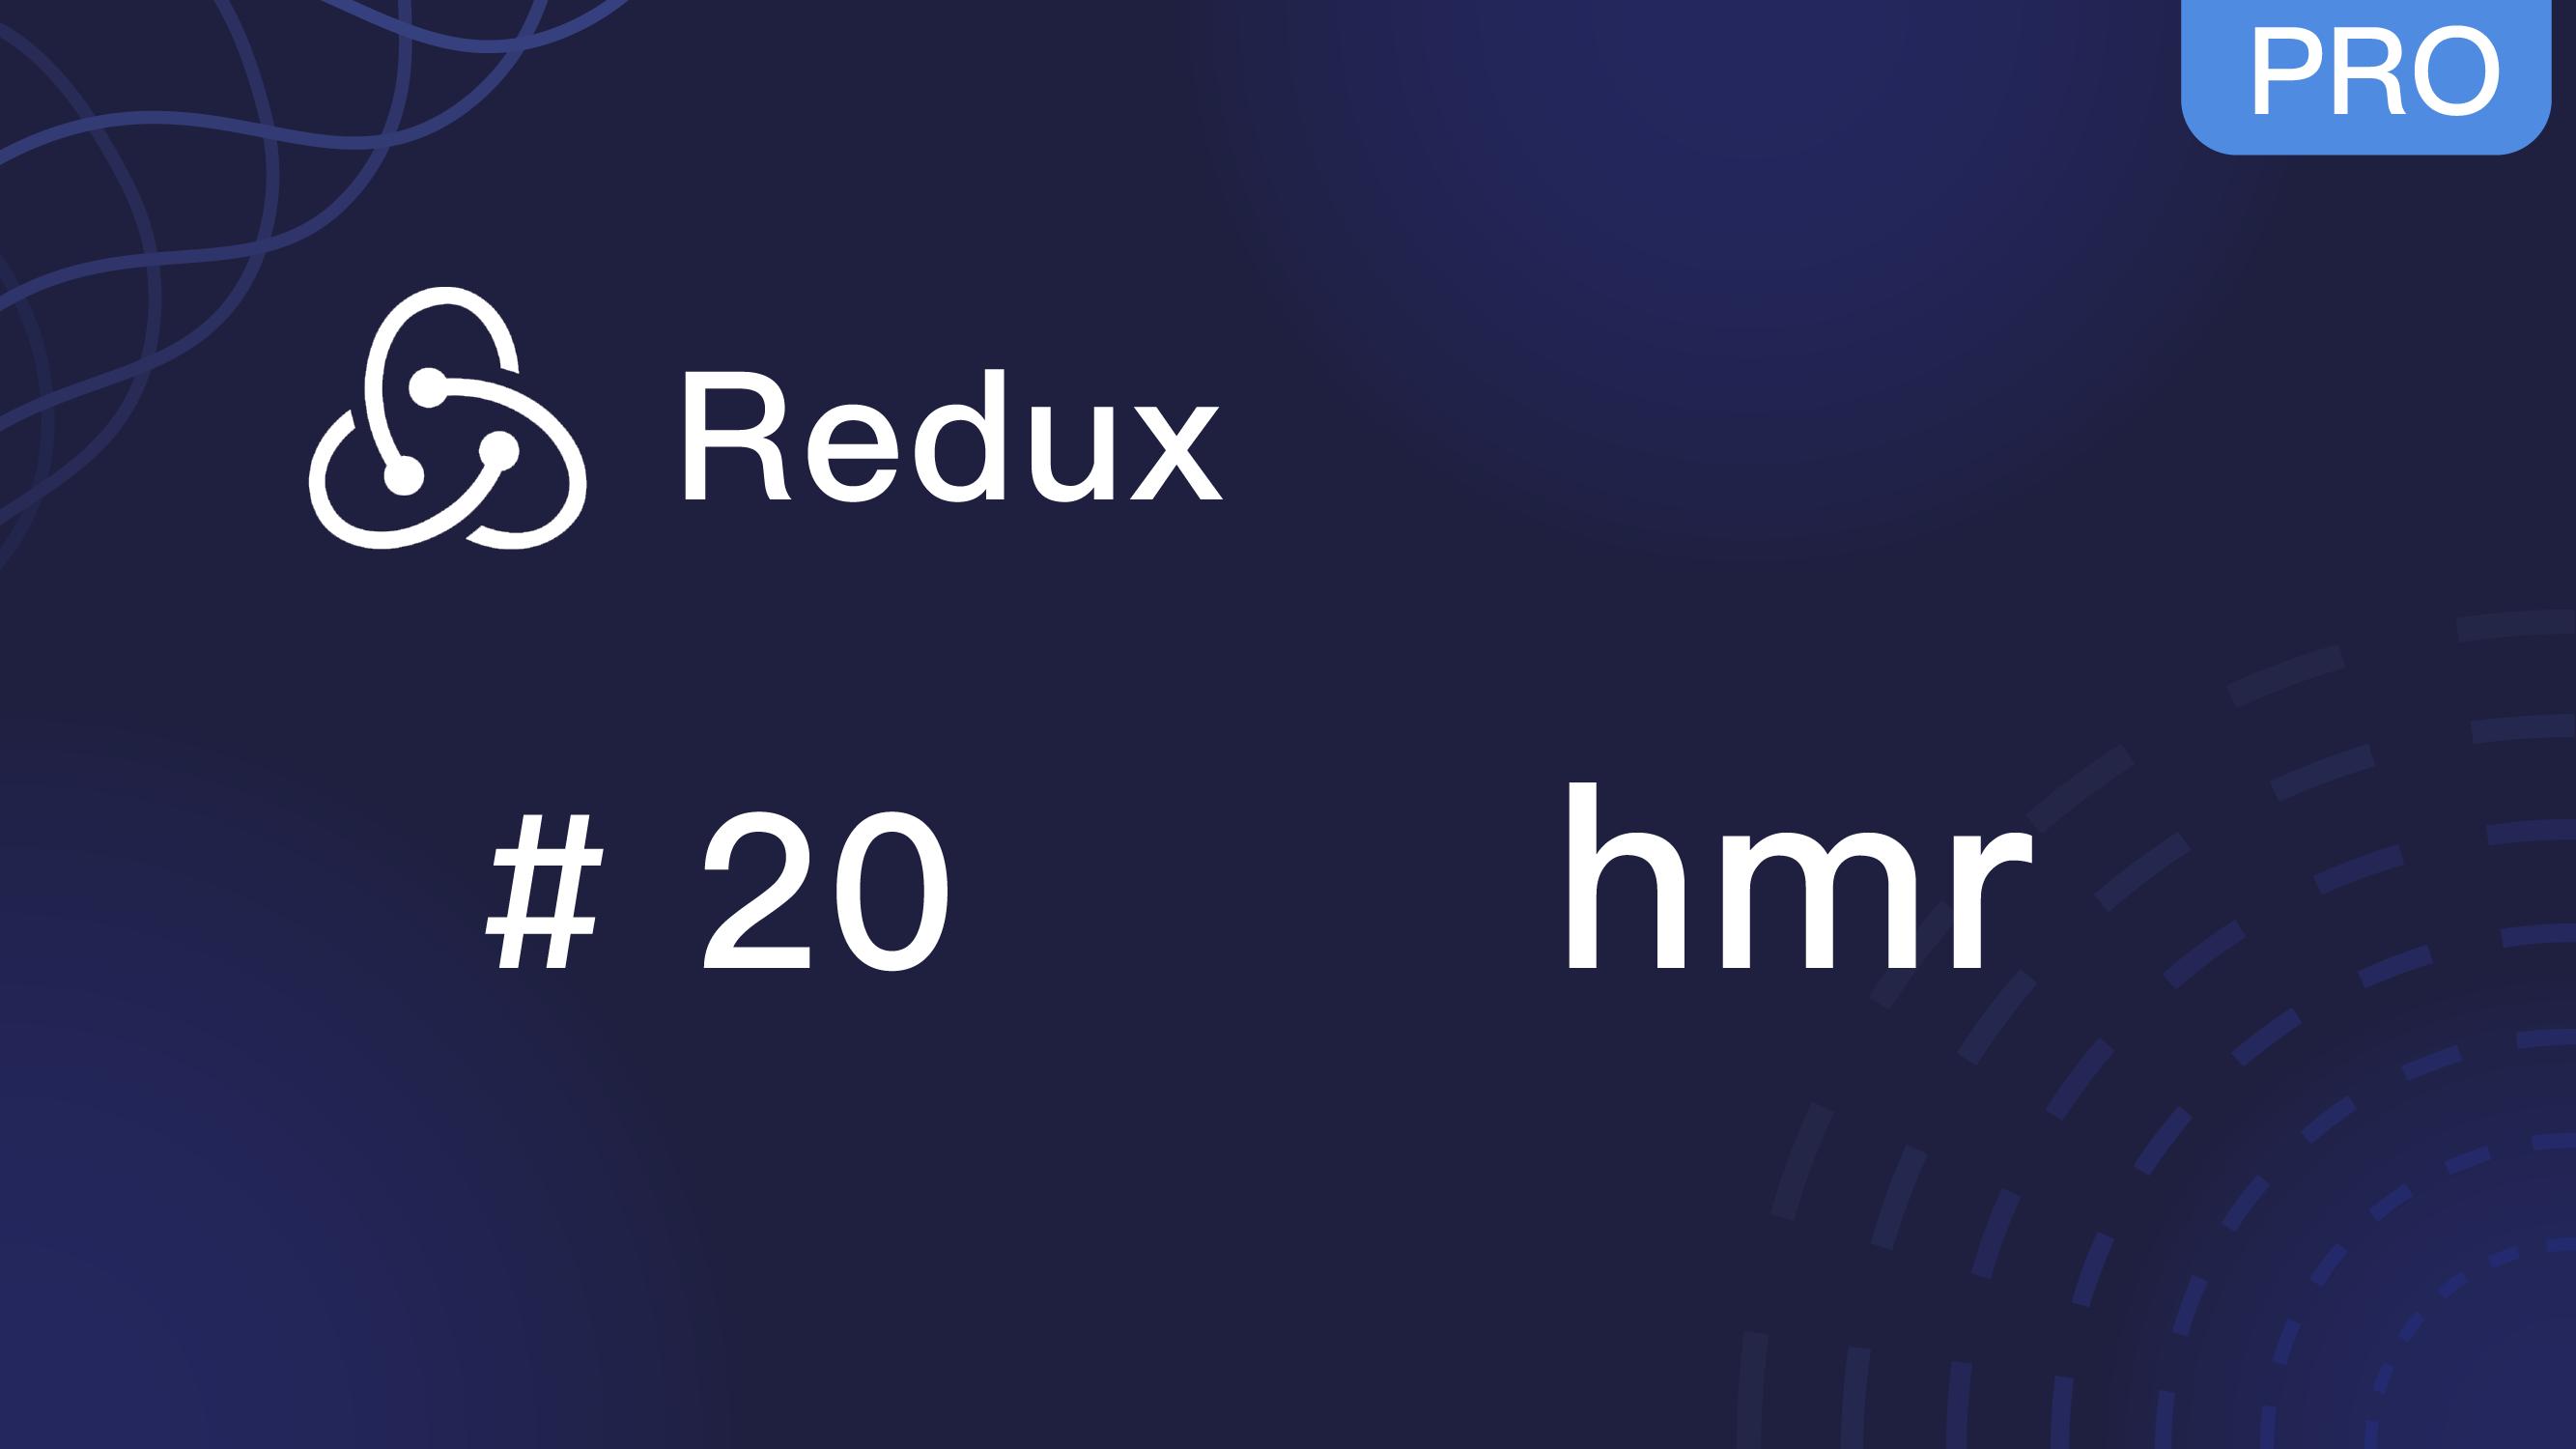 Redux 入门教程 #20 配置热模块加载 hmr(完结)